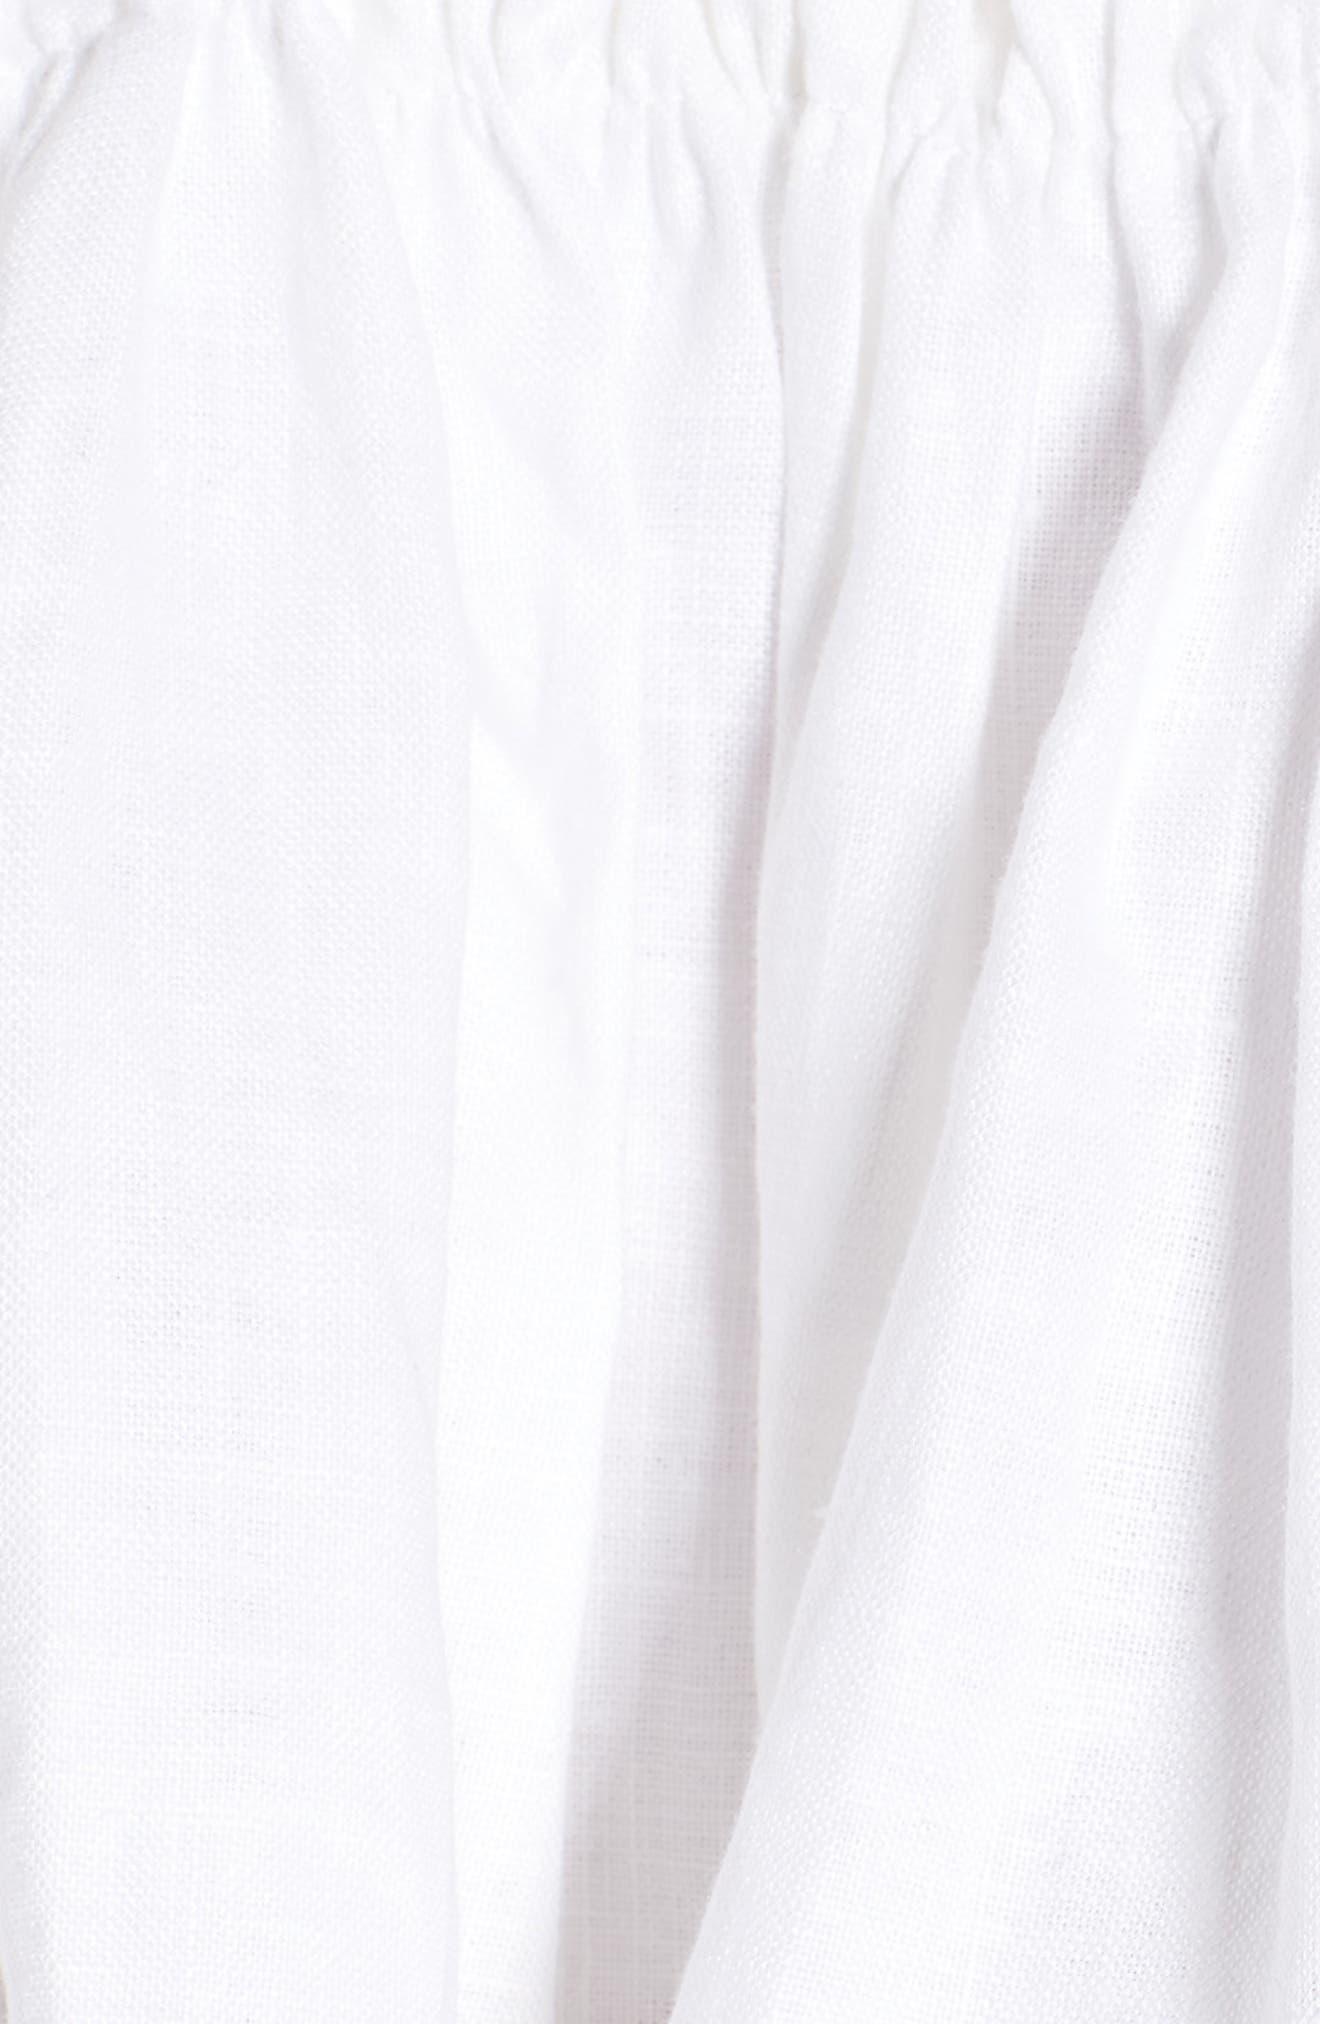 Pietro Cinched Linen Crop Top,                             Alternate thumbnail 5, color,                             100